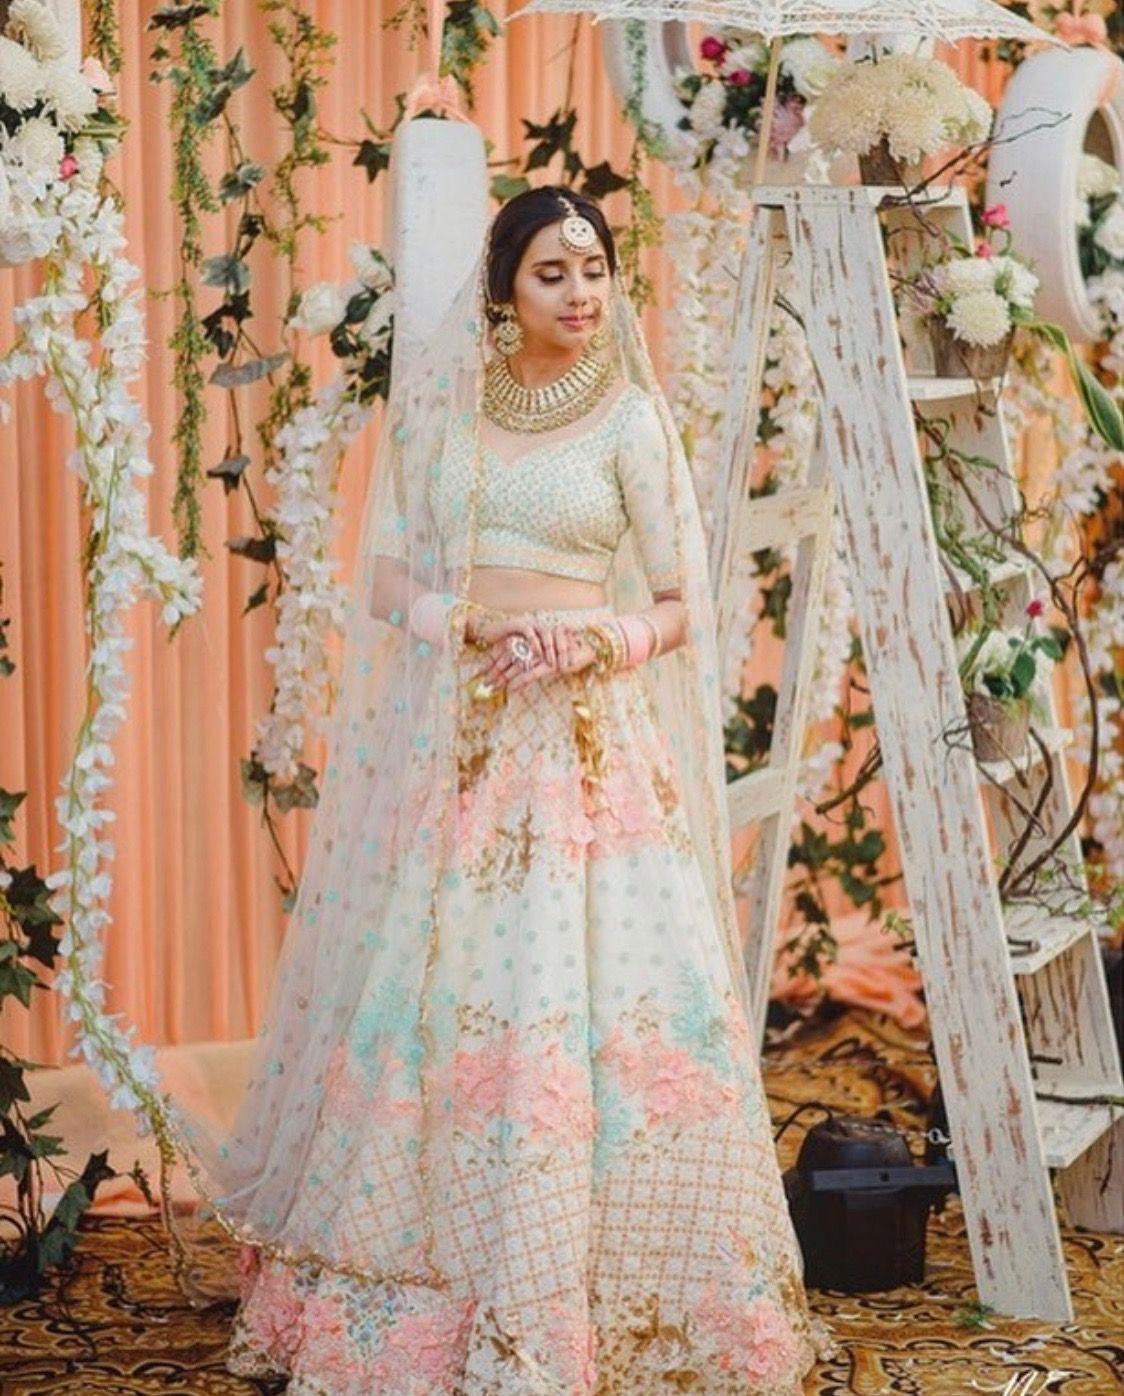 Outfit Anupreet Sidhu Indian MarriageLehenga WeddingBridal OutfitsTraditional